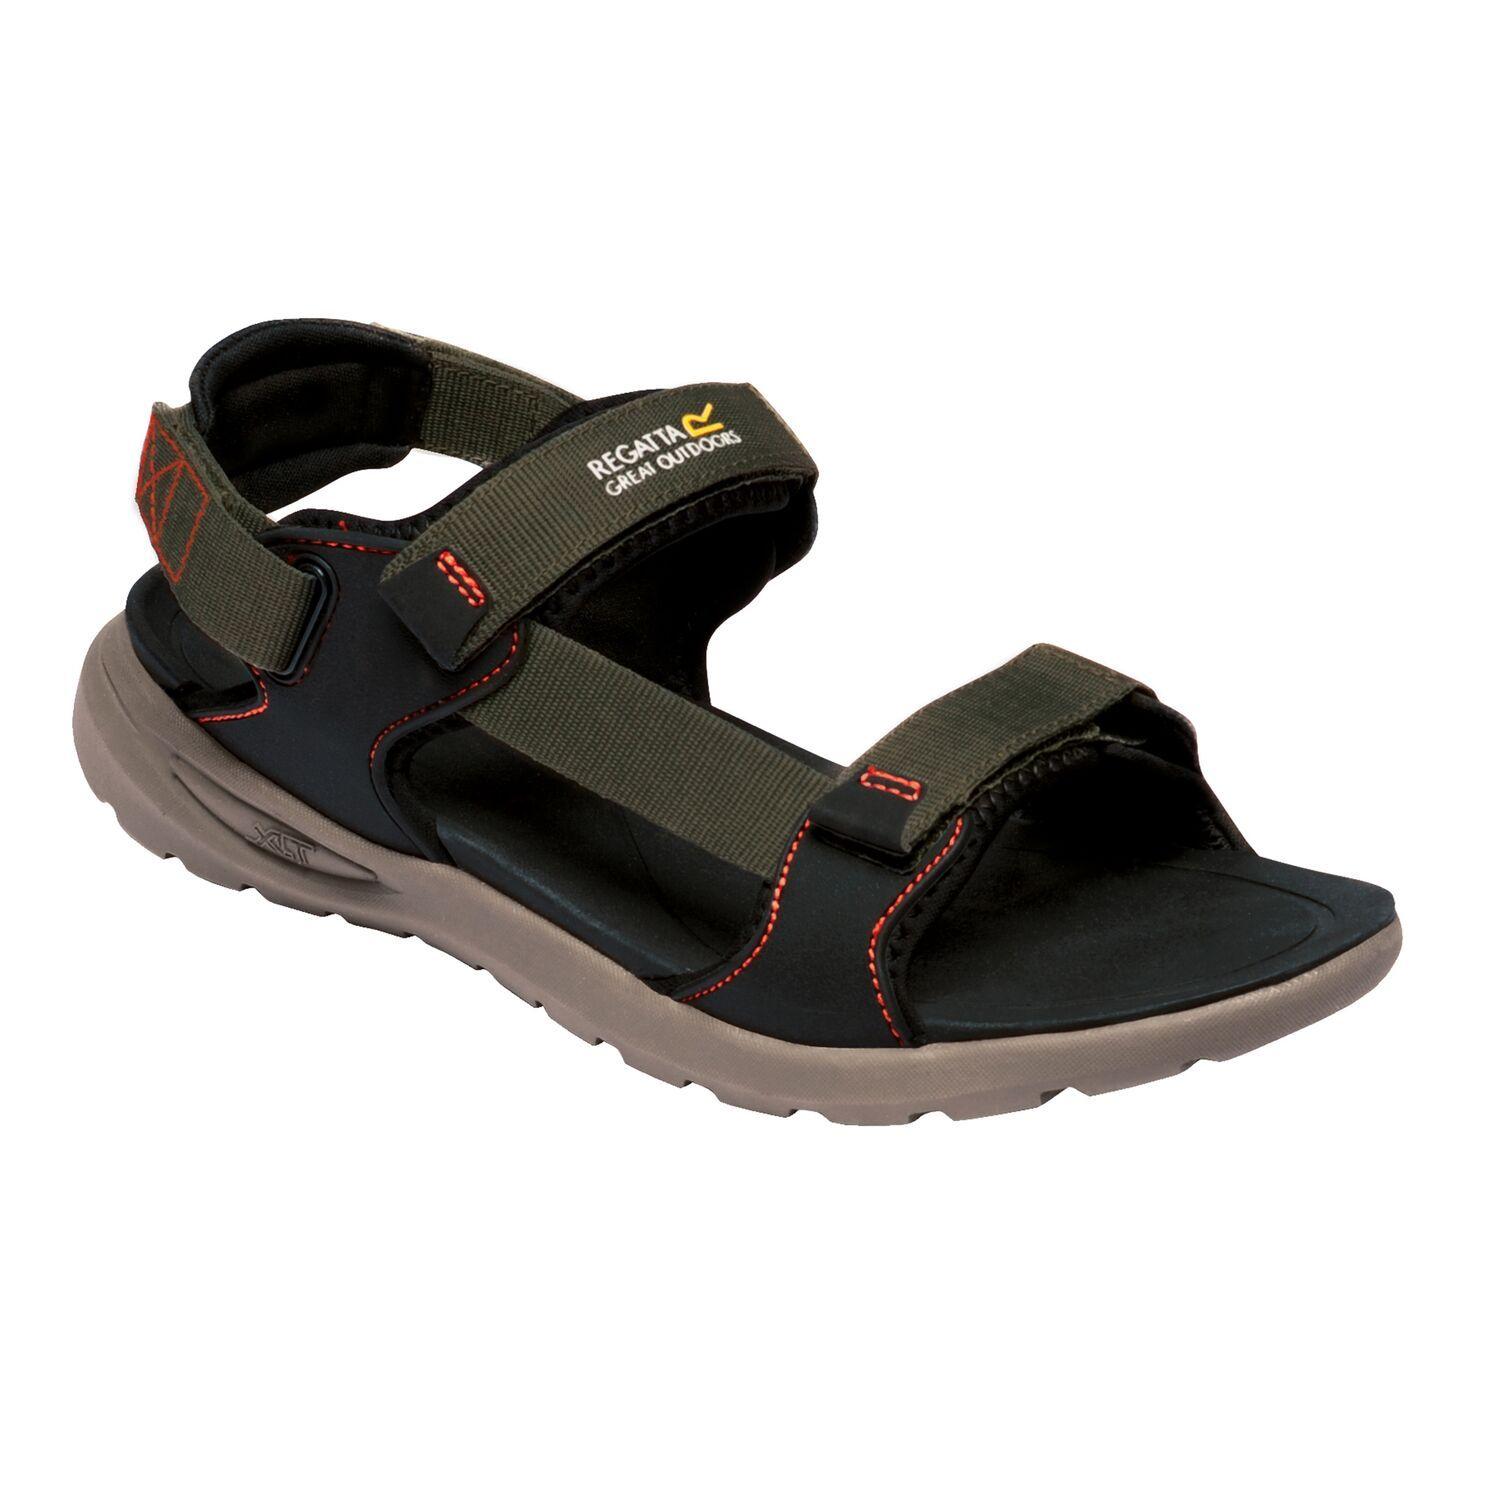 Regatta Mens Marine Web Sandals